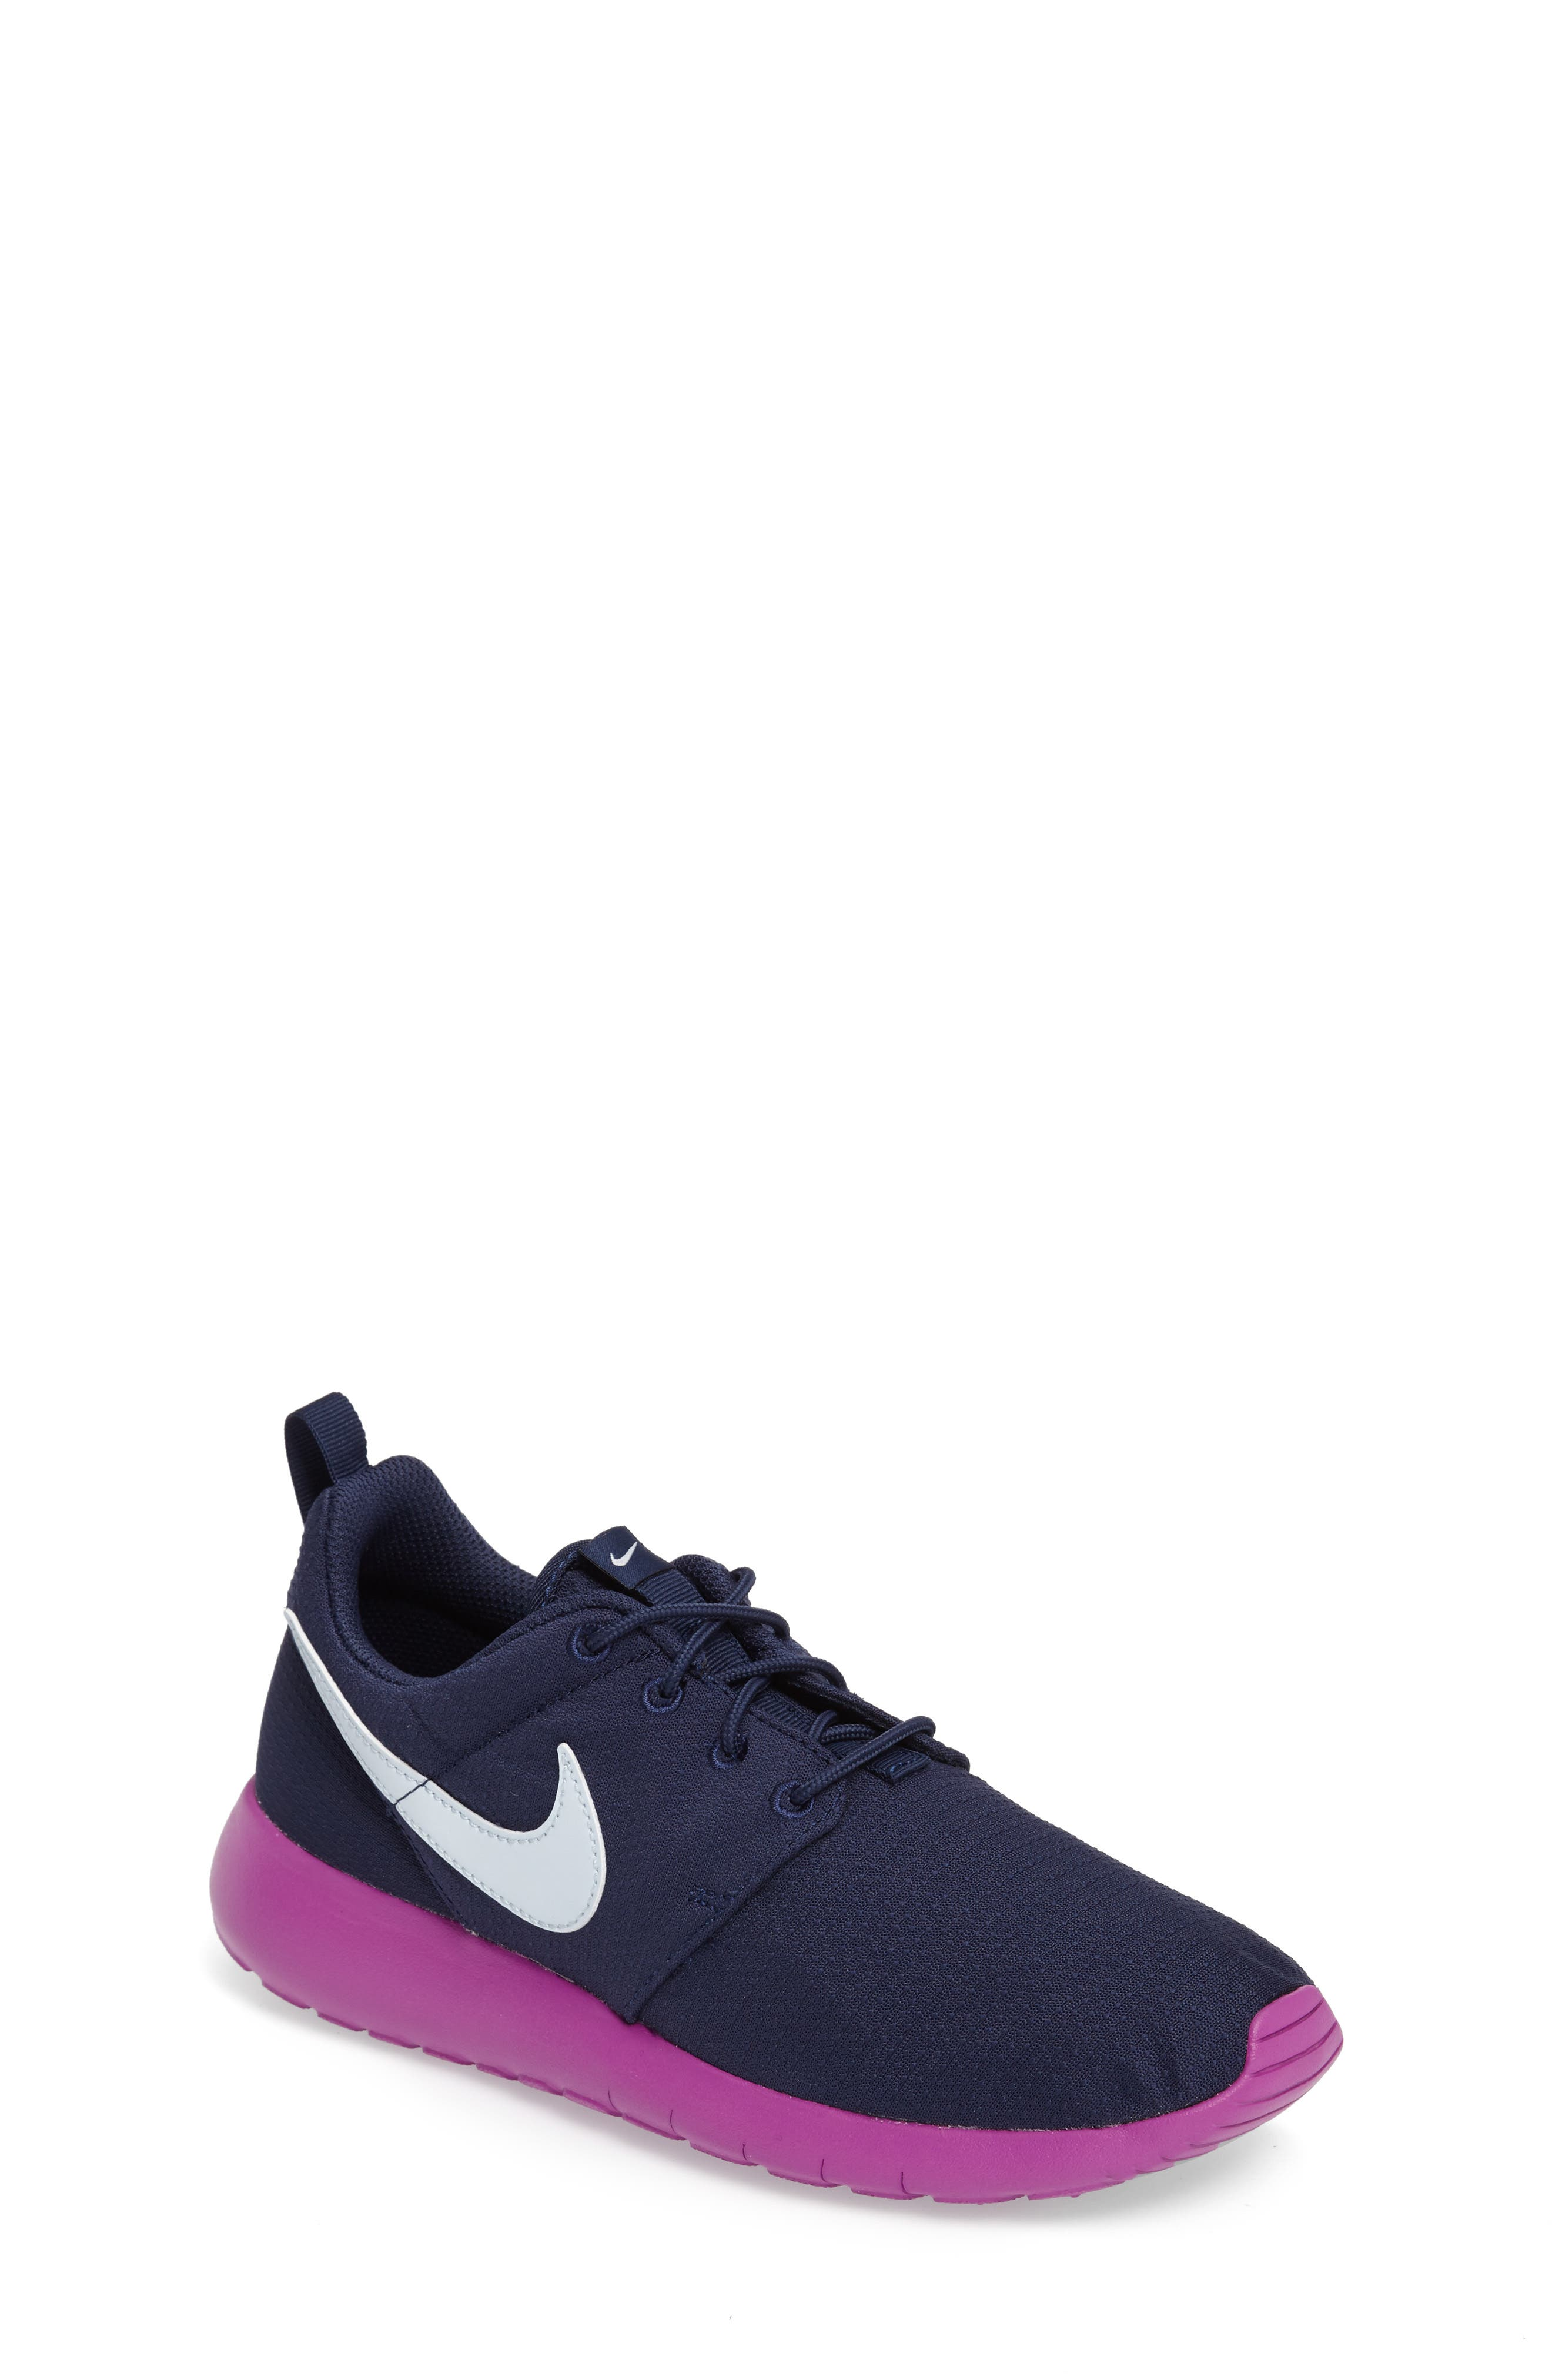 'Roshe Run' Athletic Shoe,                             Alternate thumbnail 91, color,